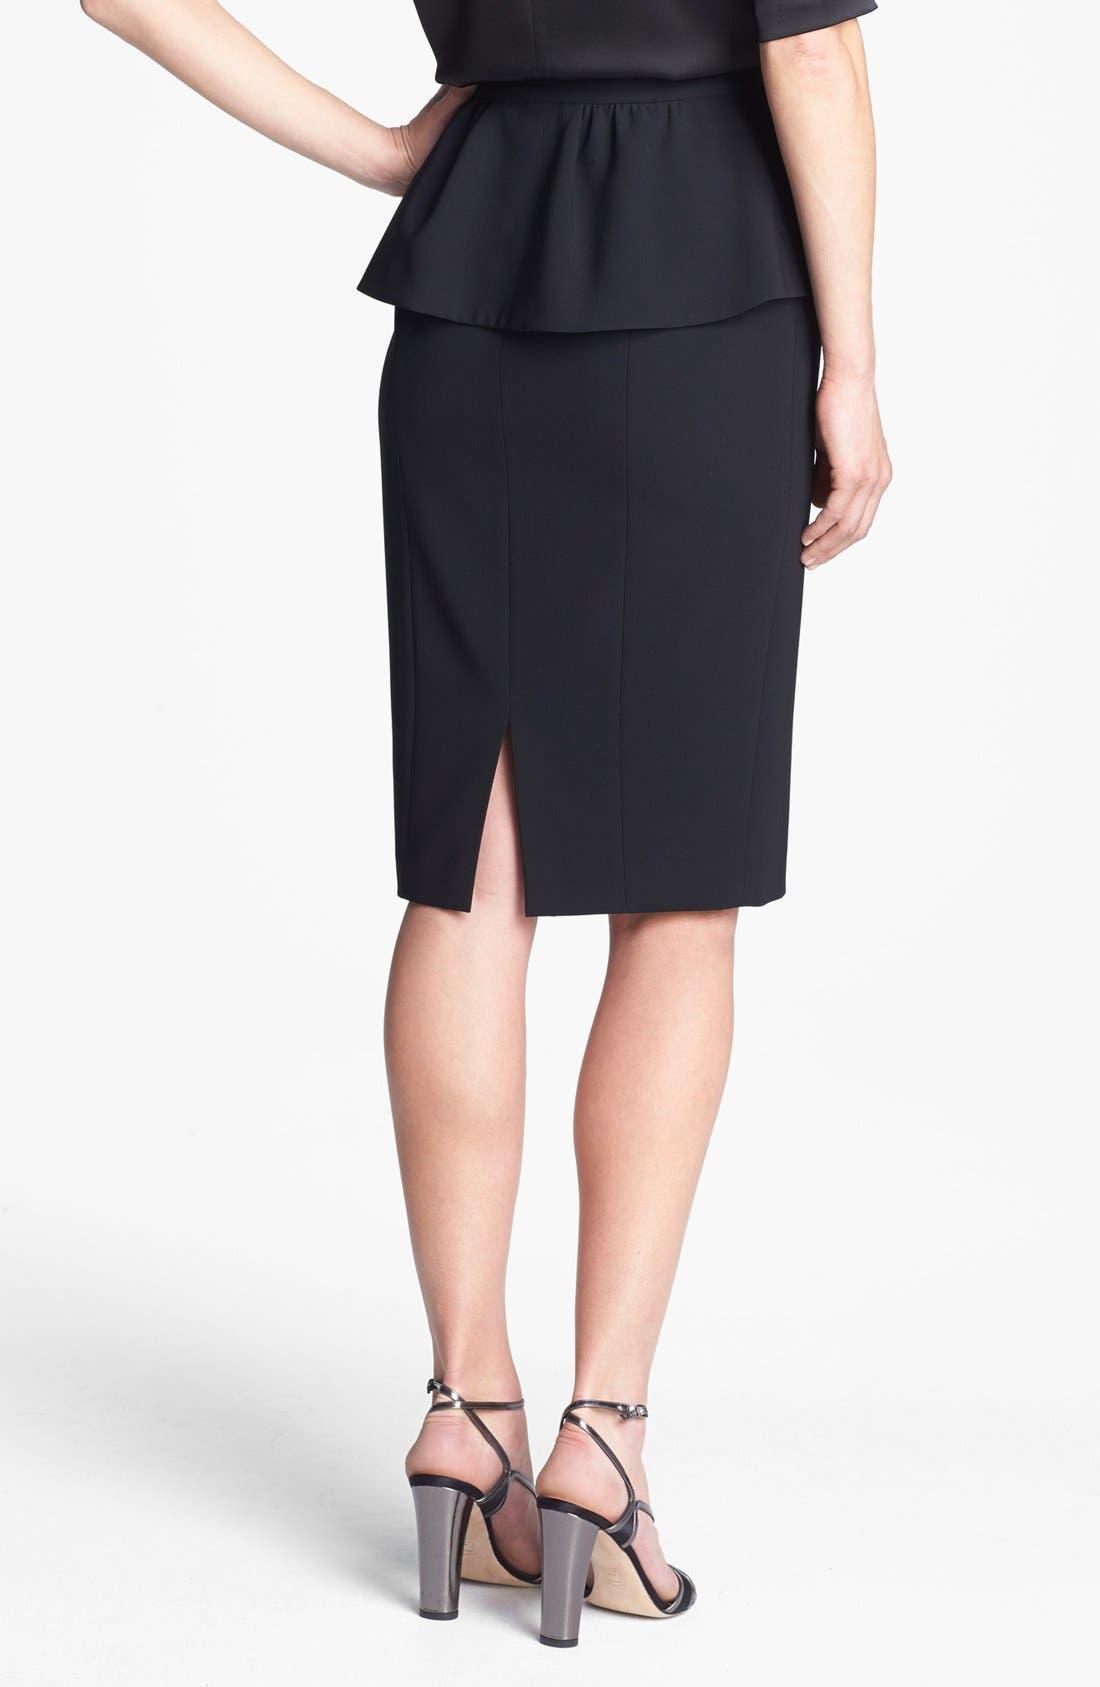 ST. JOHN COLLECTION, Draped Peplum Crepe Marocain Skirt, Alternate thumbnail 2, color, 001